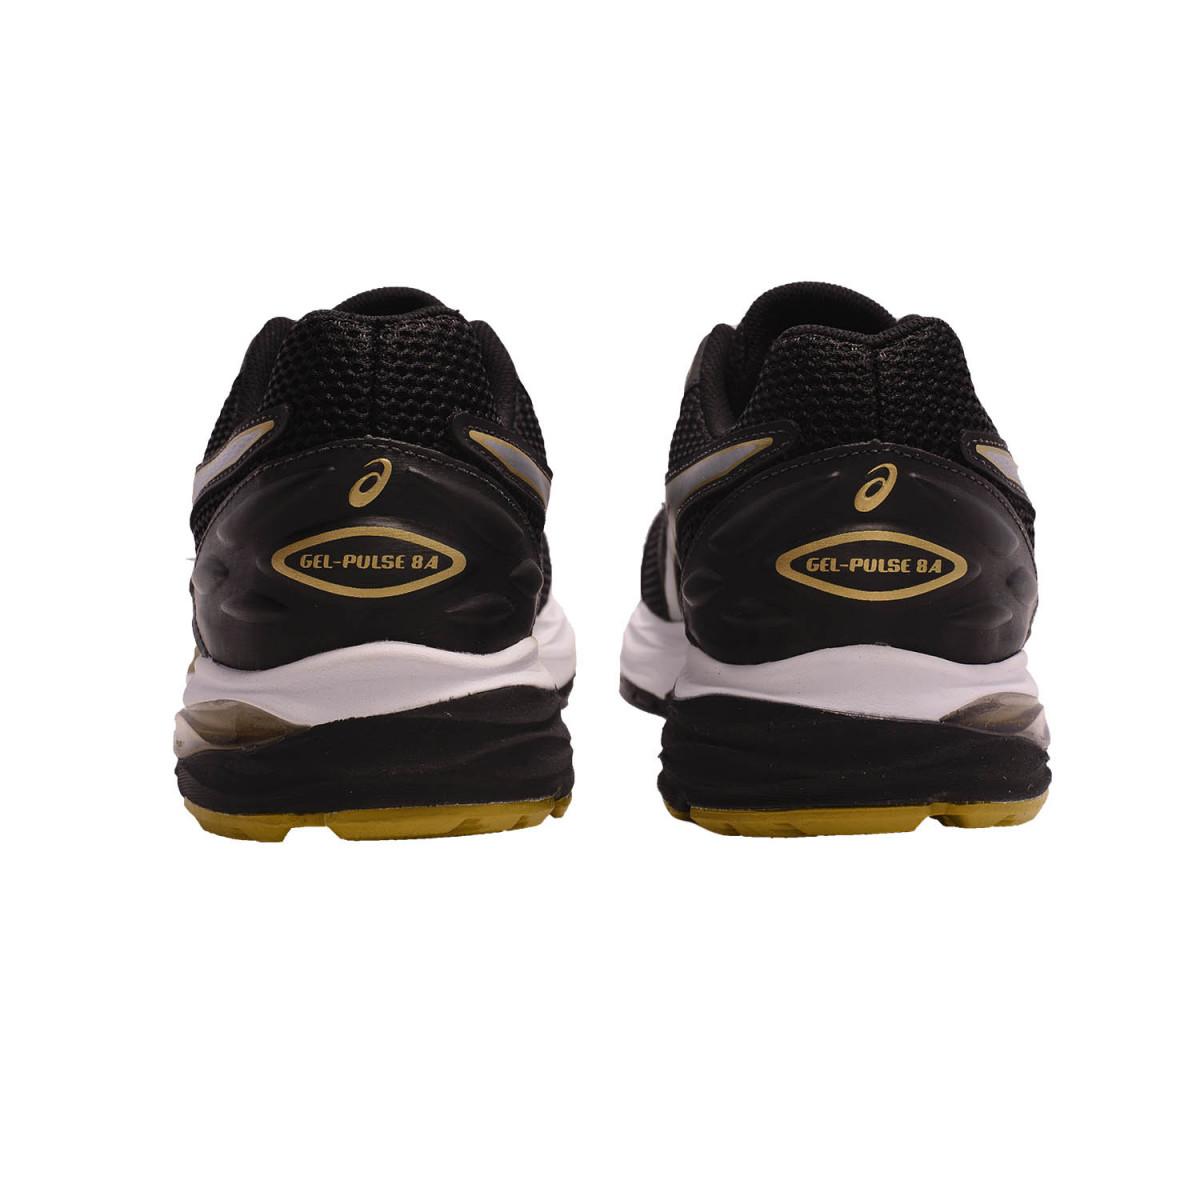 Zapatillas Asics Gel Pulse 8 A - Asics - Marca 366c62b5c6718